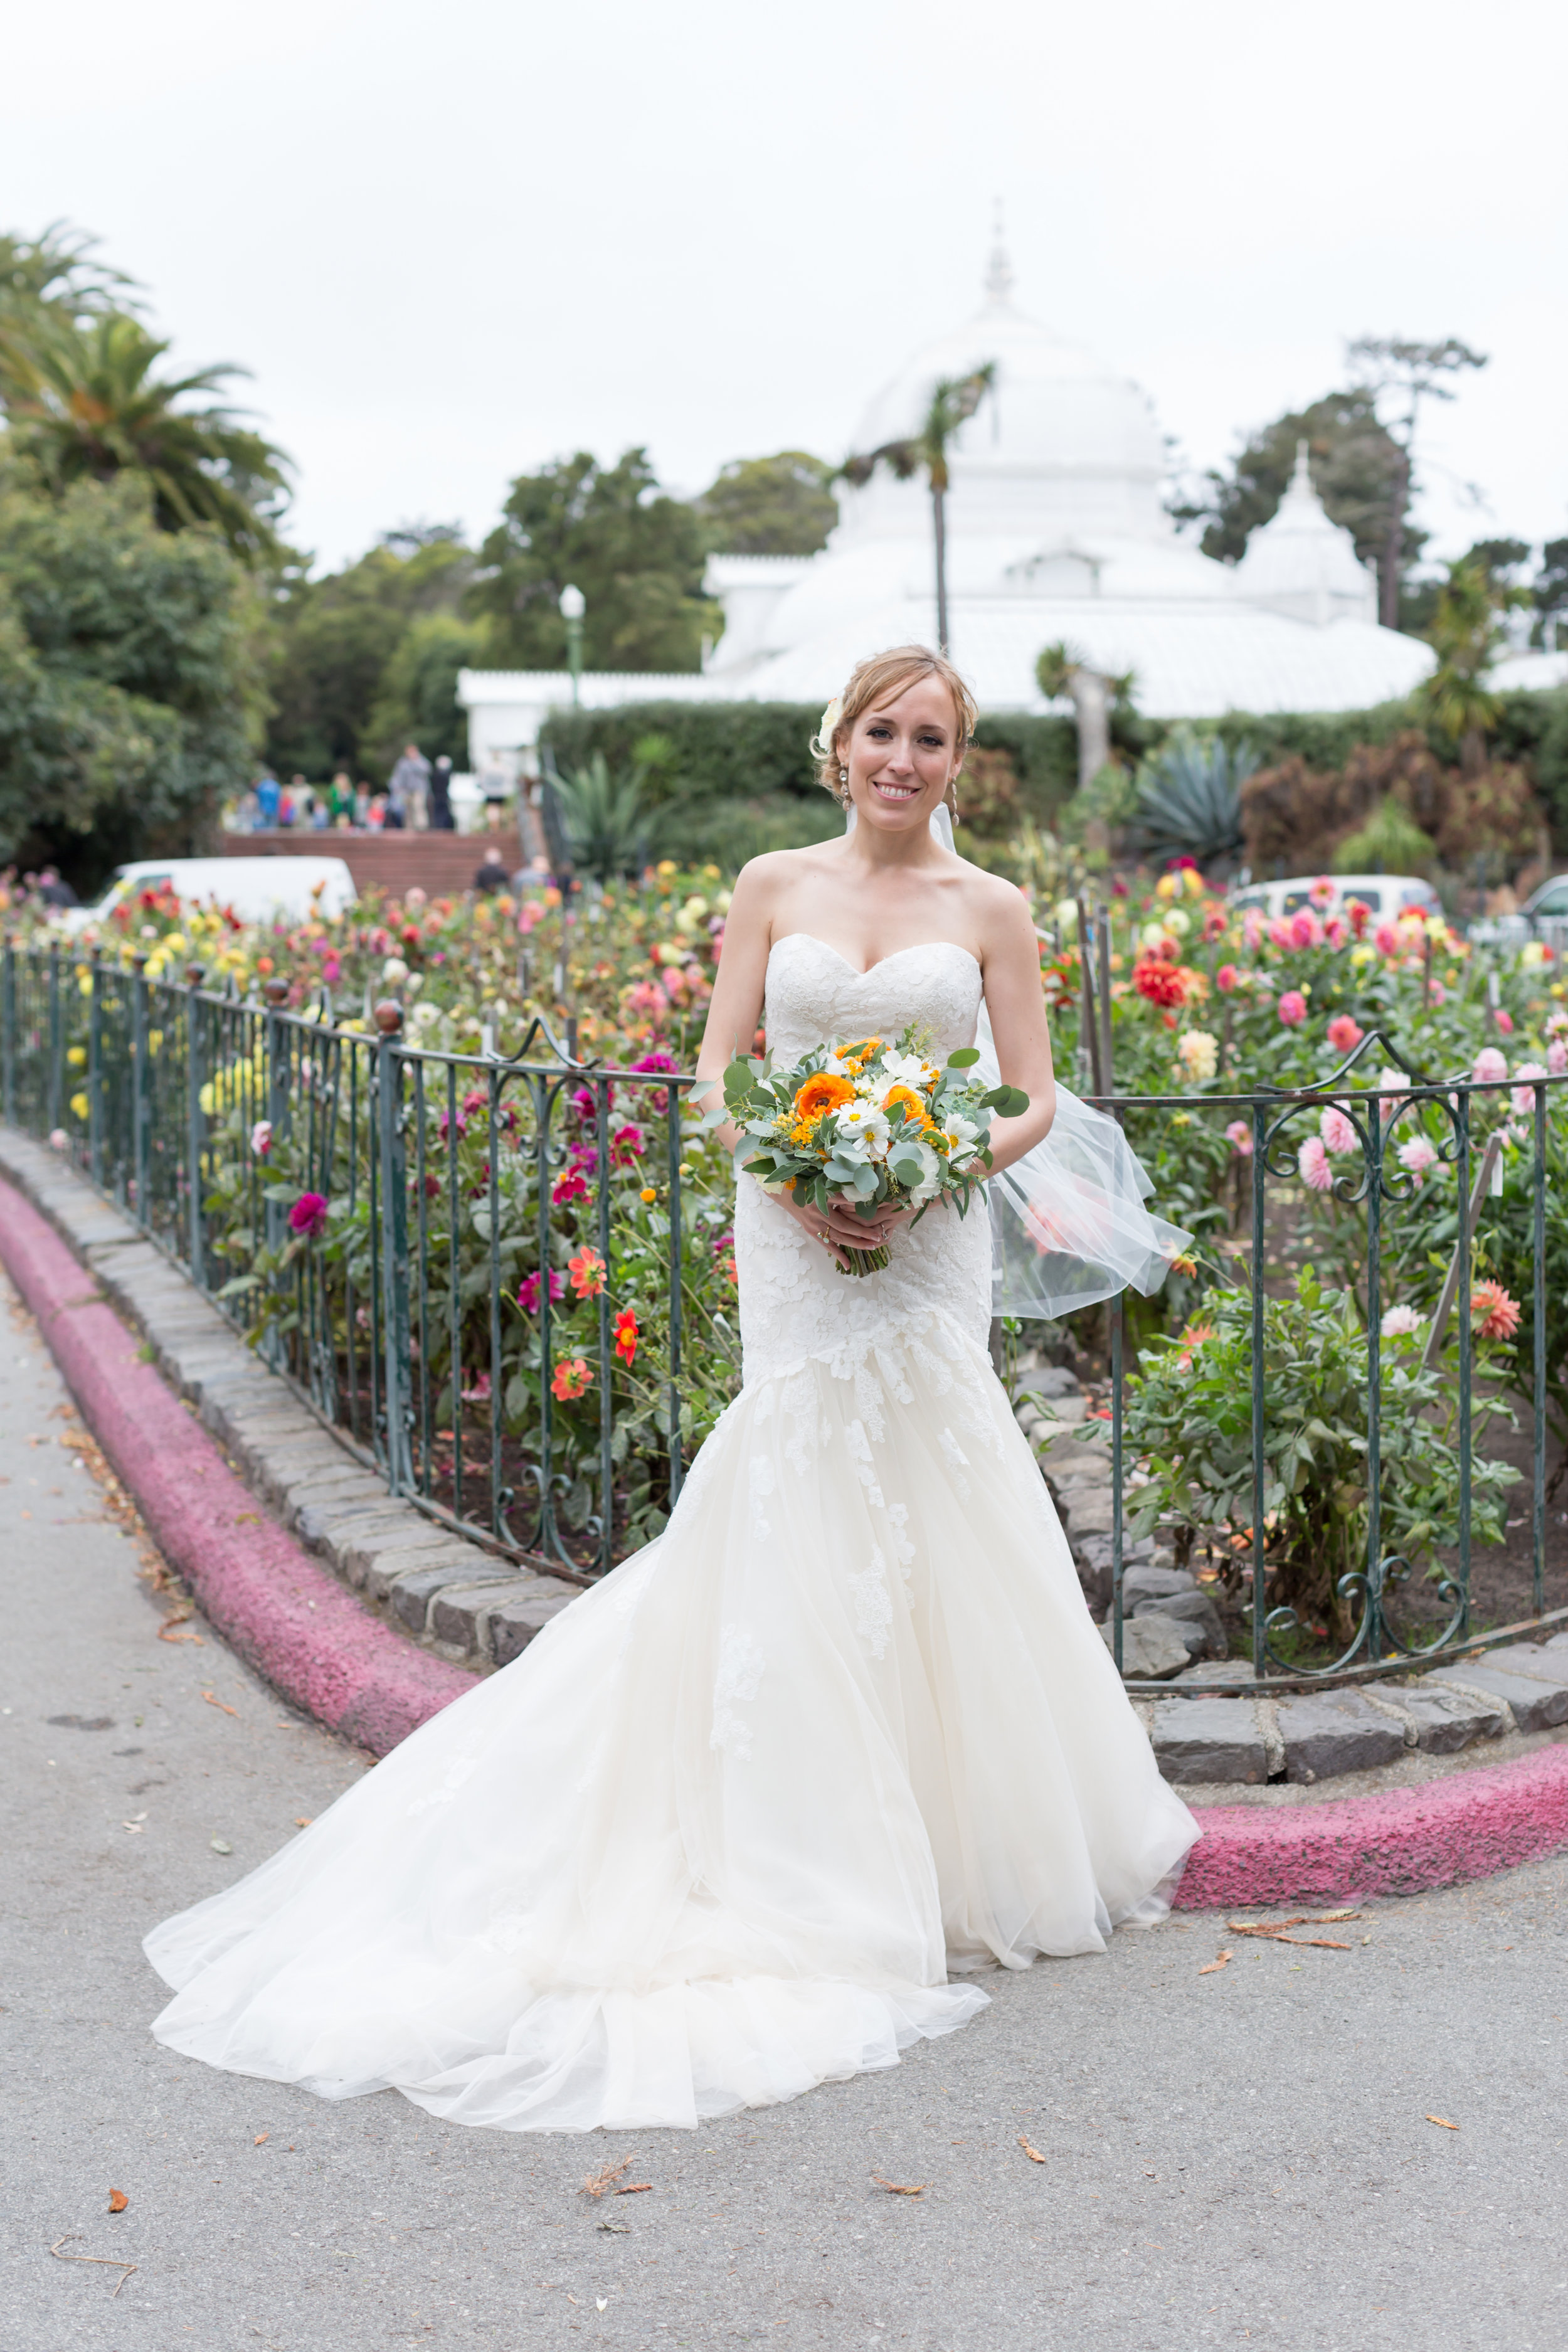 San-Francisco-Wedding-34.jpg